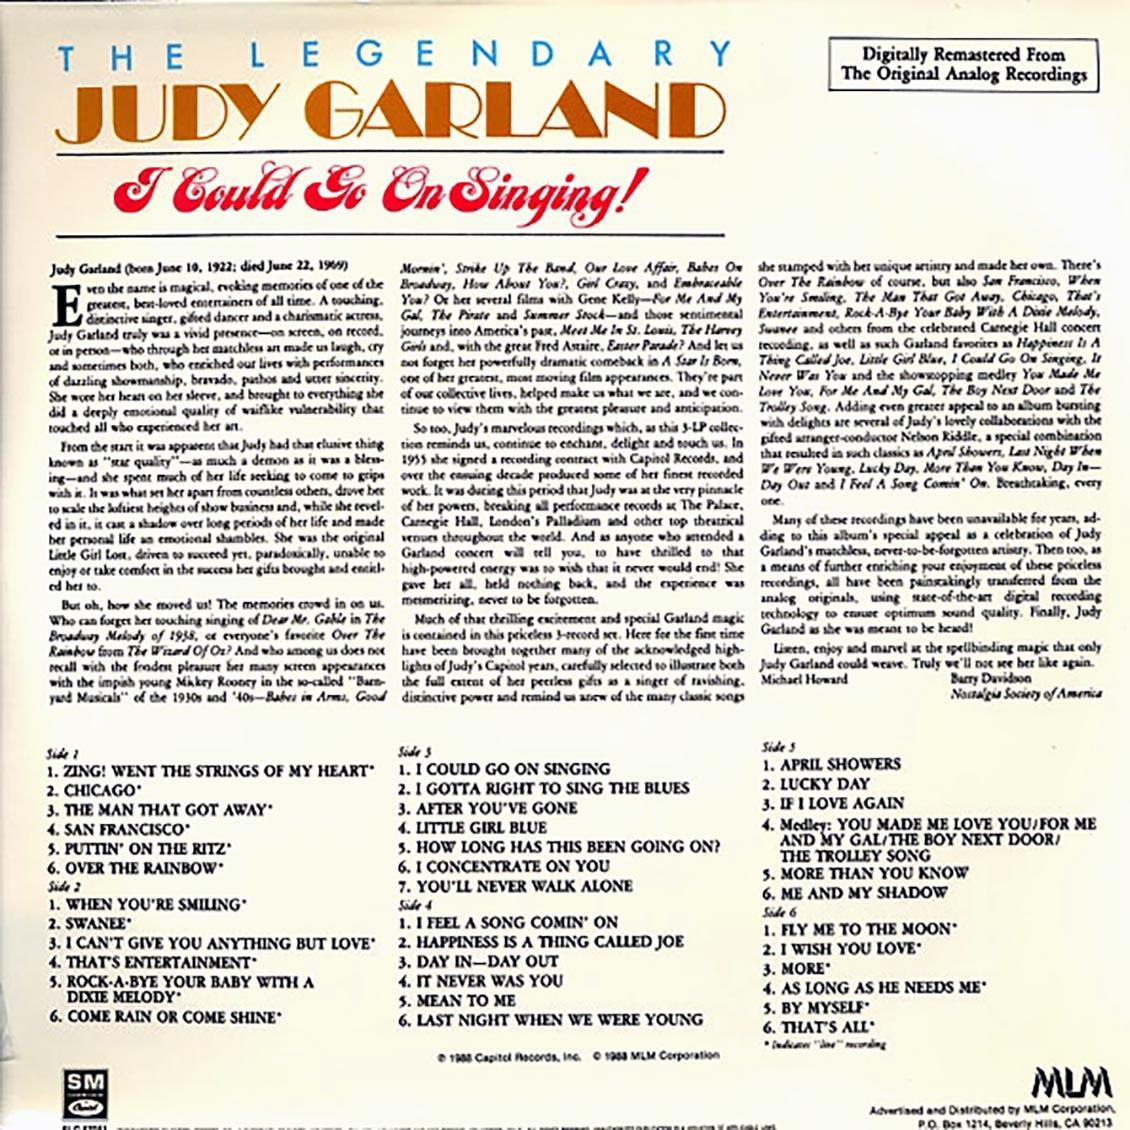 Judy Garland (주디 갈랜드) - The Legendary Judy Garland: I Could Go On Singing [3LP]